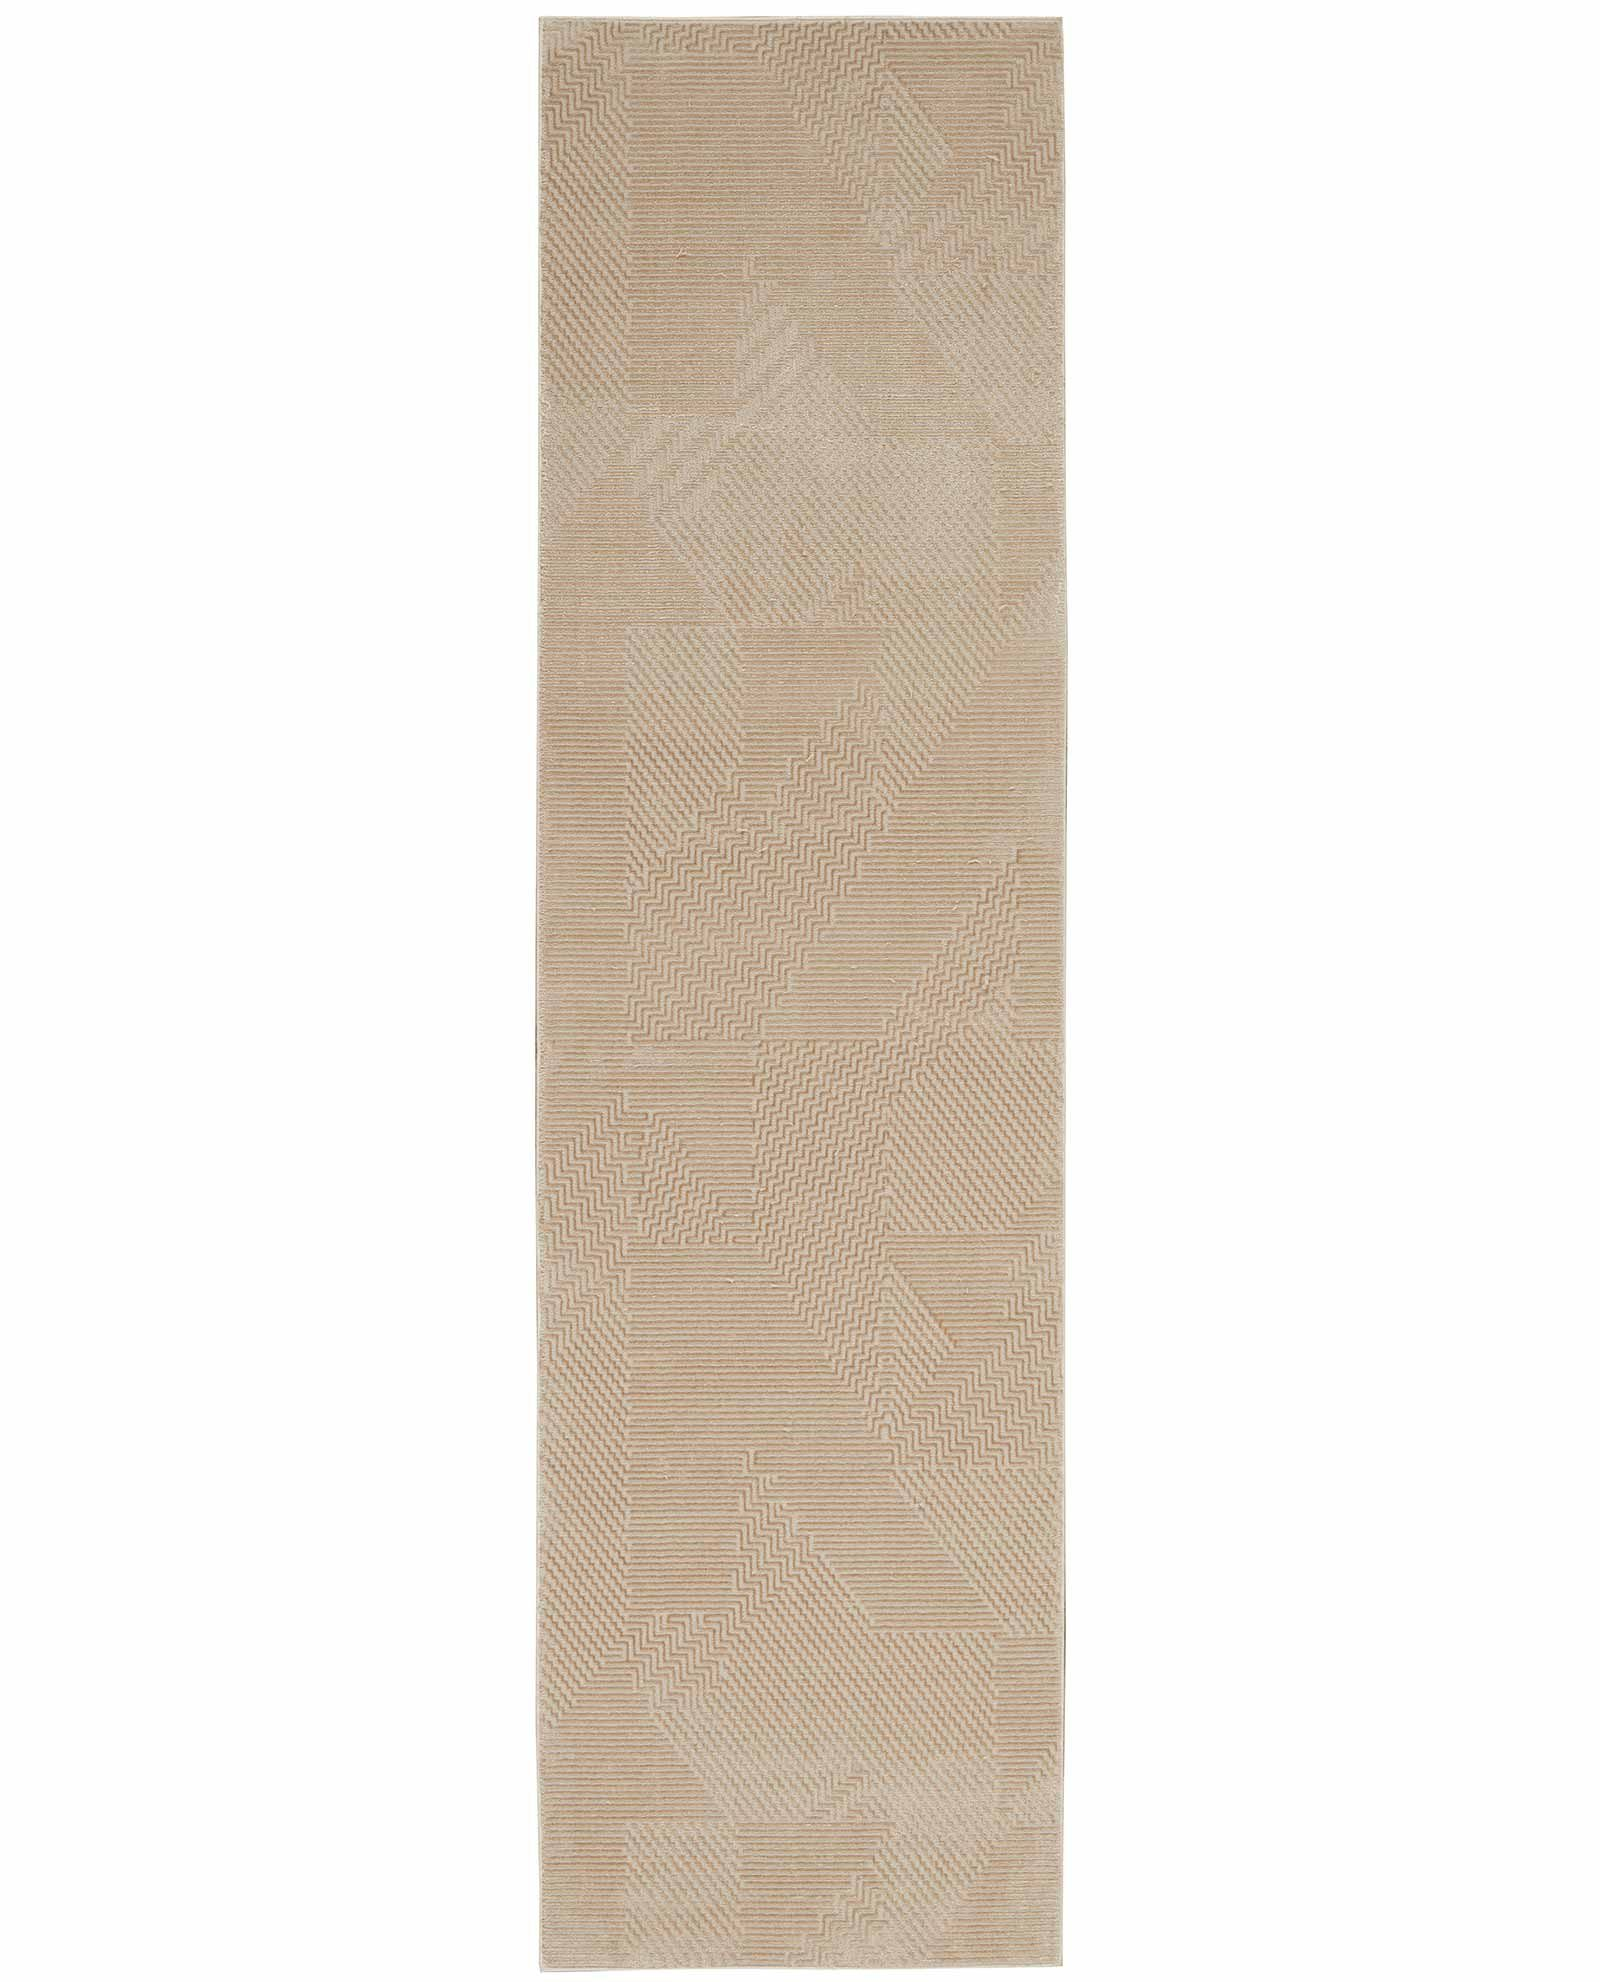 Calvin Klein rug Orlando CK850 CK852 GREY SAFFRON 2x8 099446488077 flat